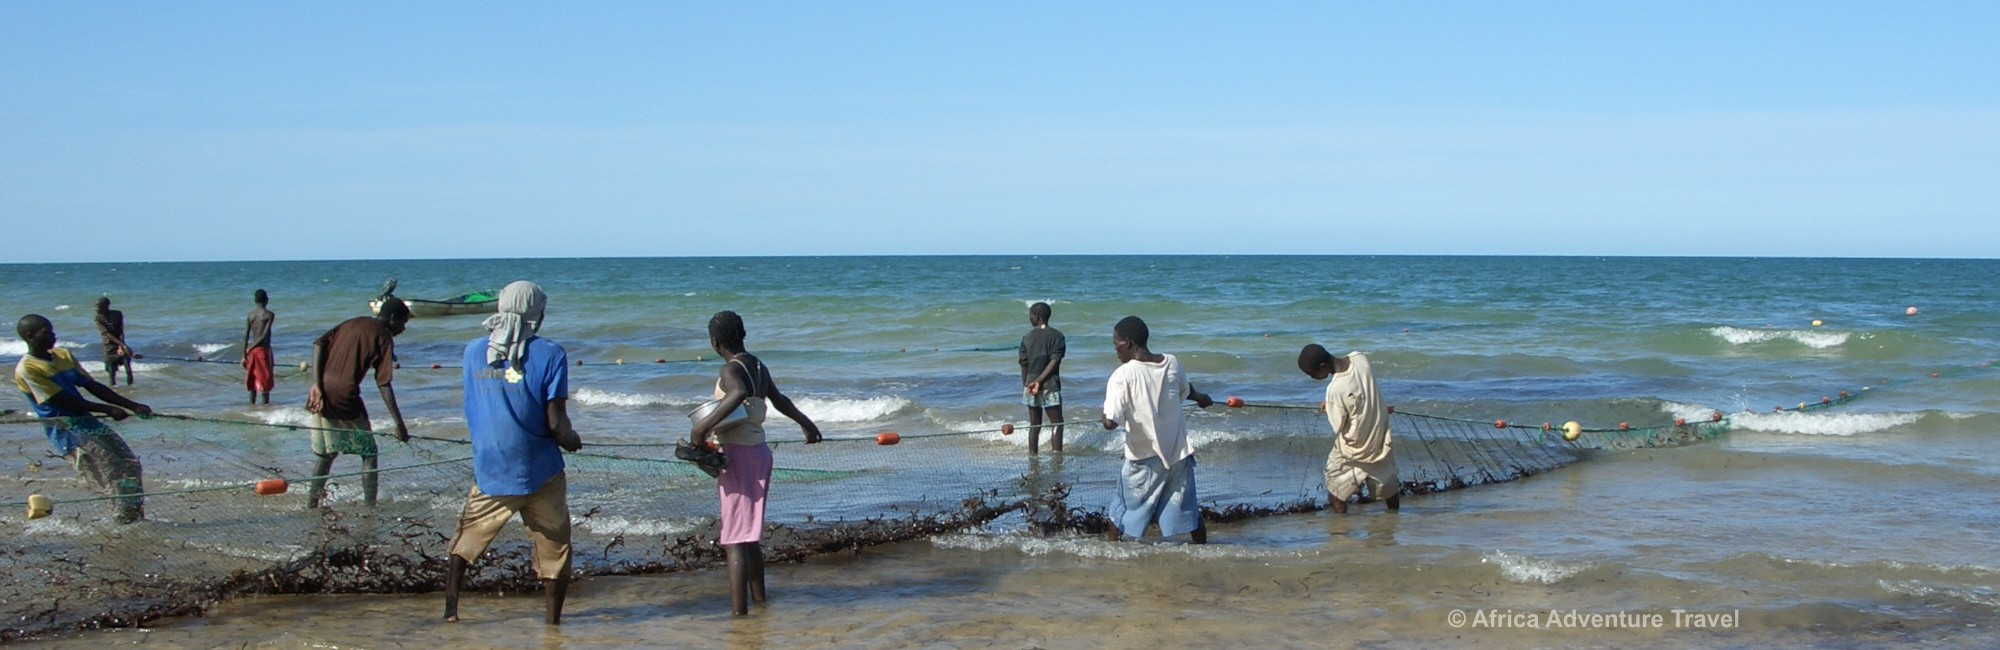 mozambique-fishing.jpg